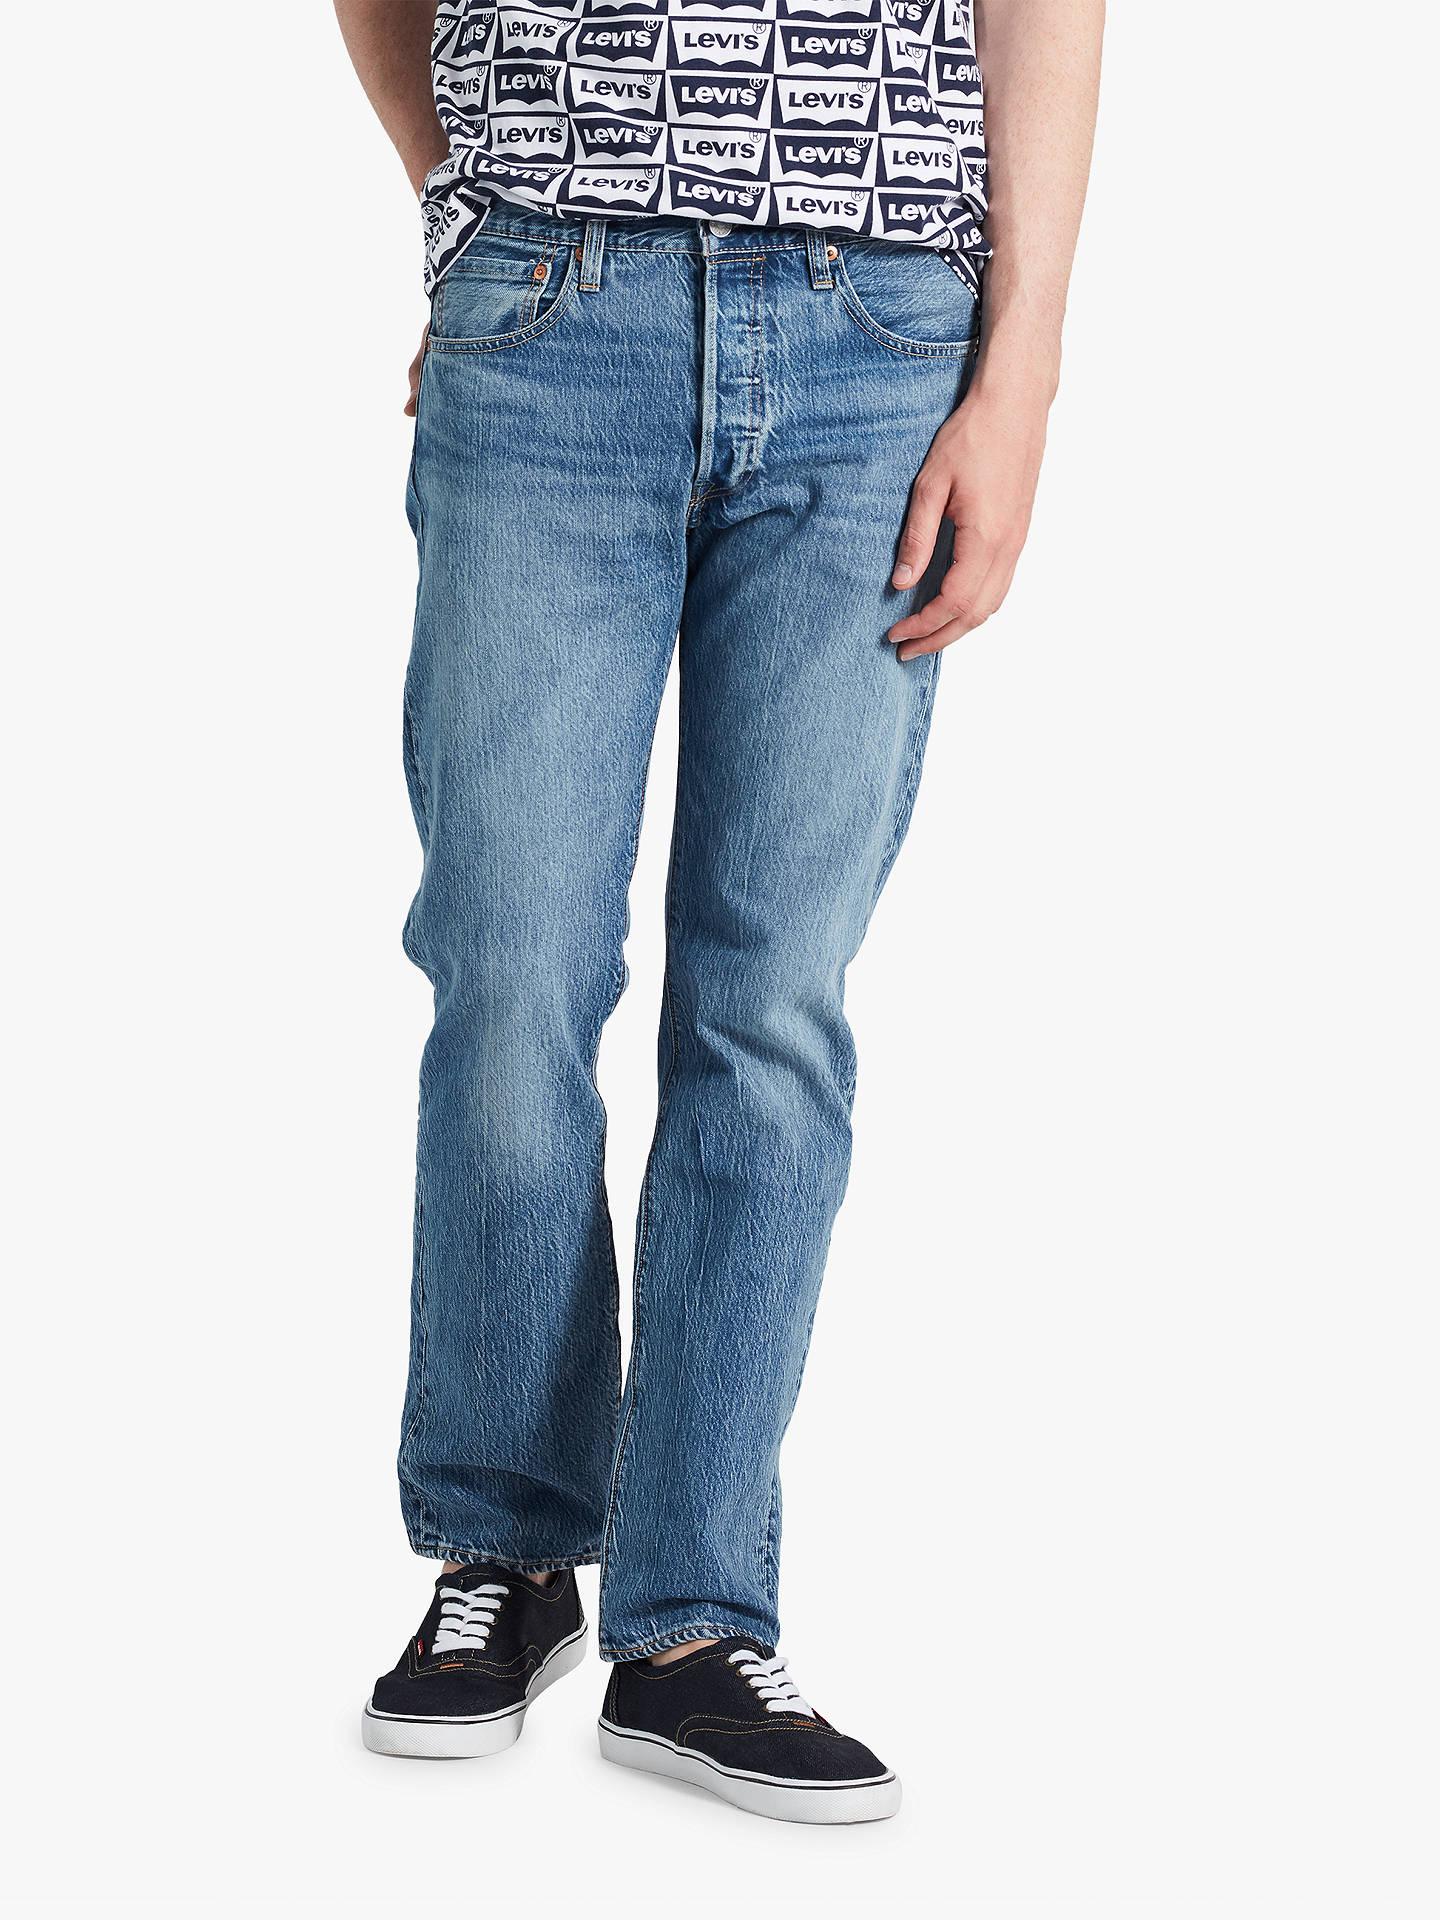 Buy Levi's 501 Original Fit Jeans, Pipe Light, 30S Online at johnlewis. ...